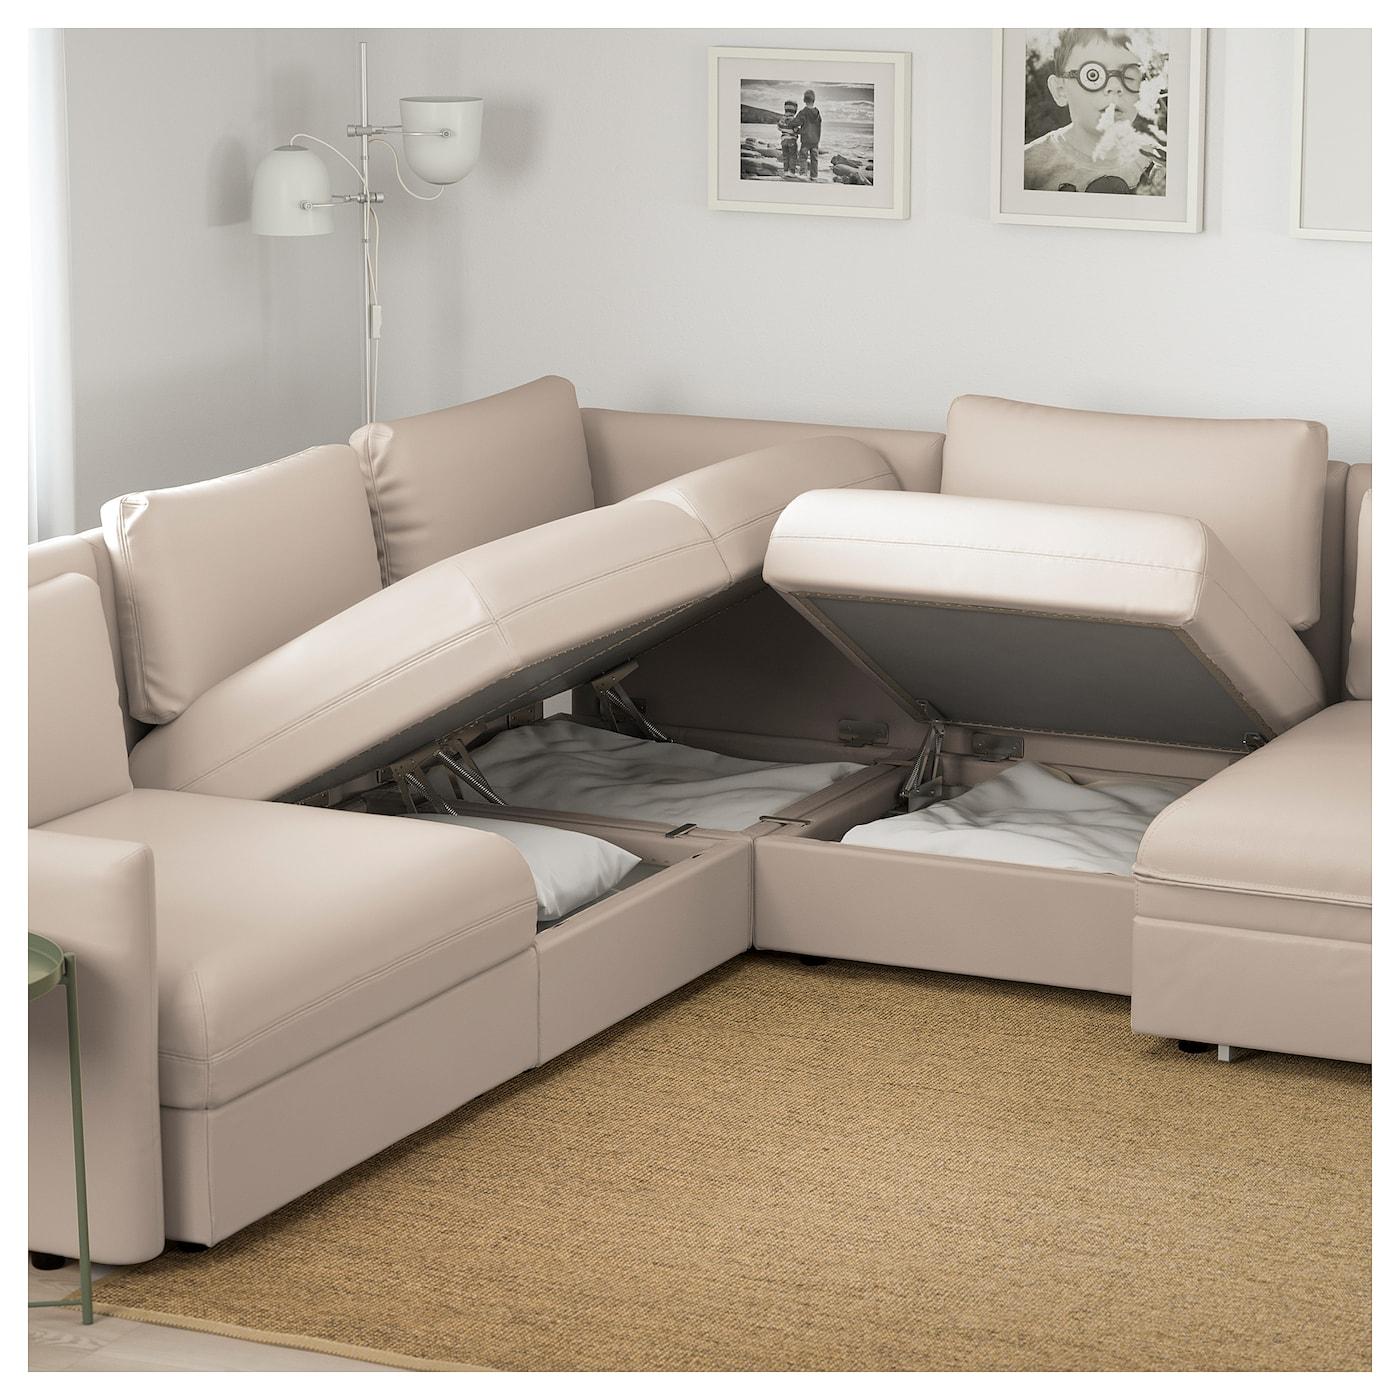 Ikea sofa corner bed 28 images friheten corner sofa for Ashley furniture sawgrass